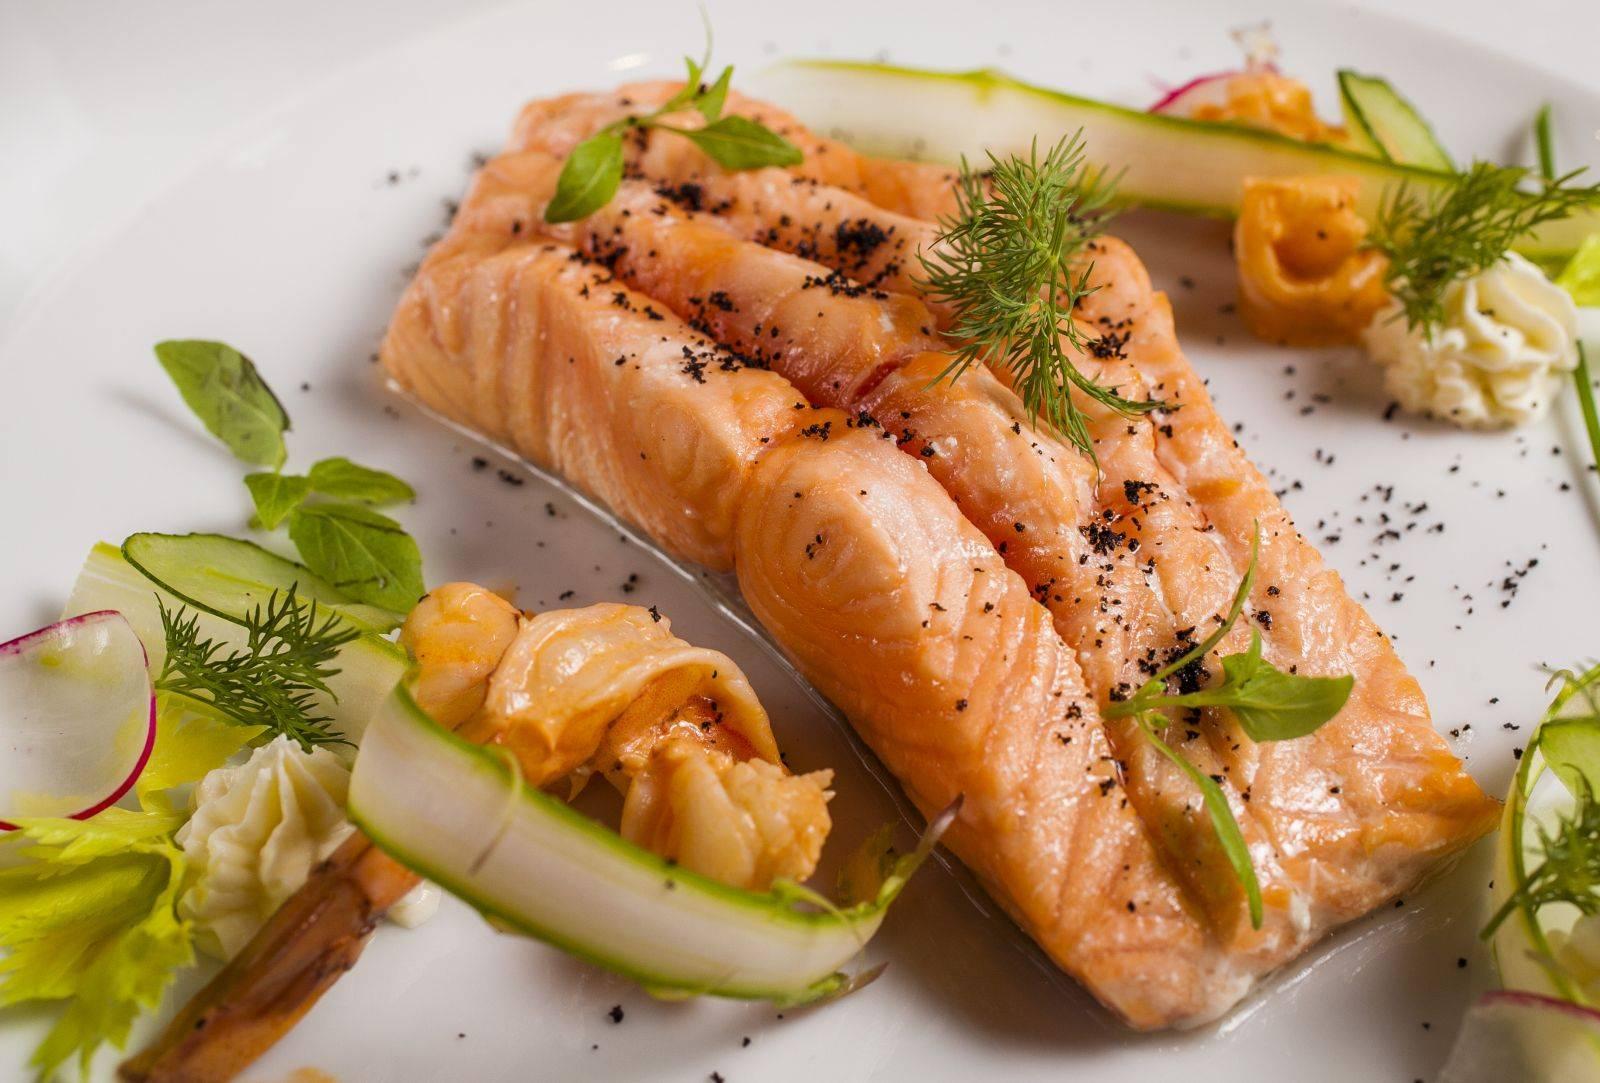 Рецепт стейка из лосося в мультиварке на пару  - стейк от 1001 еда